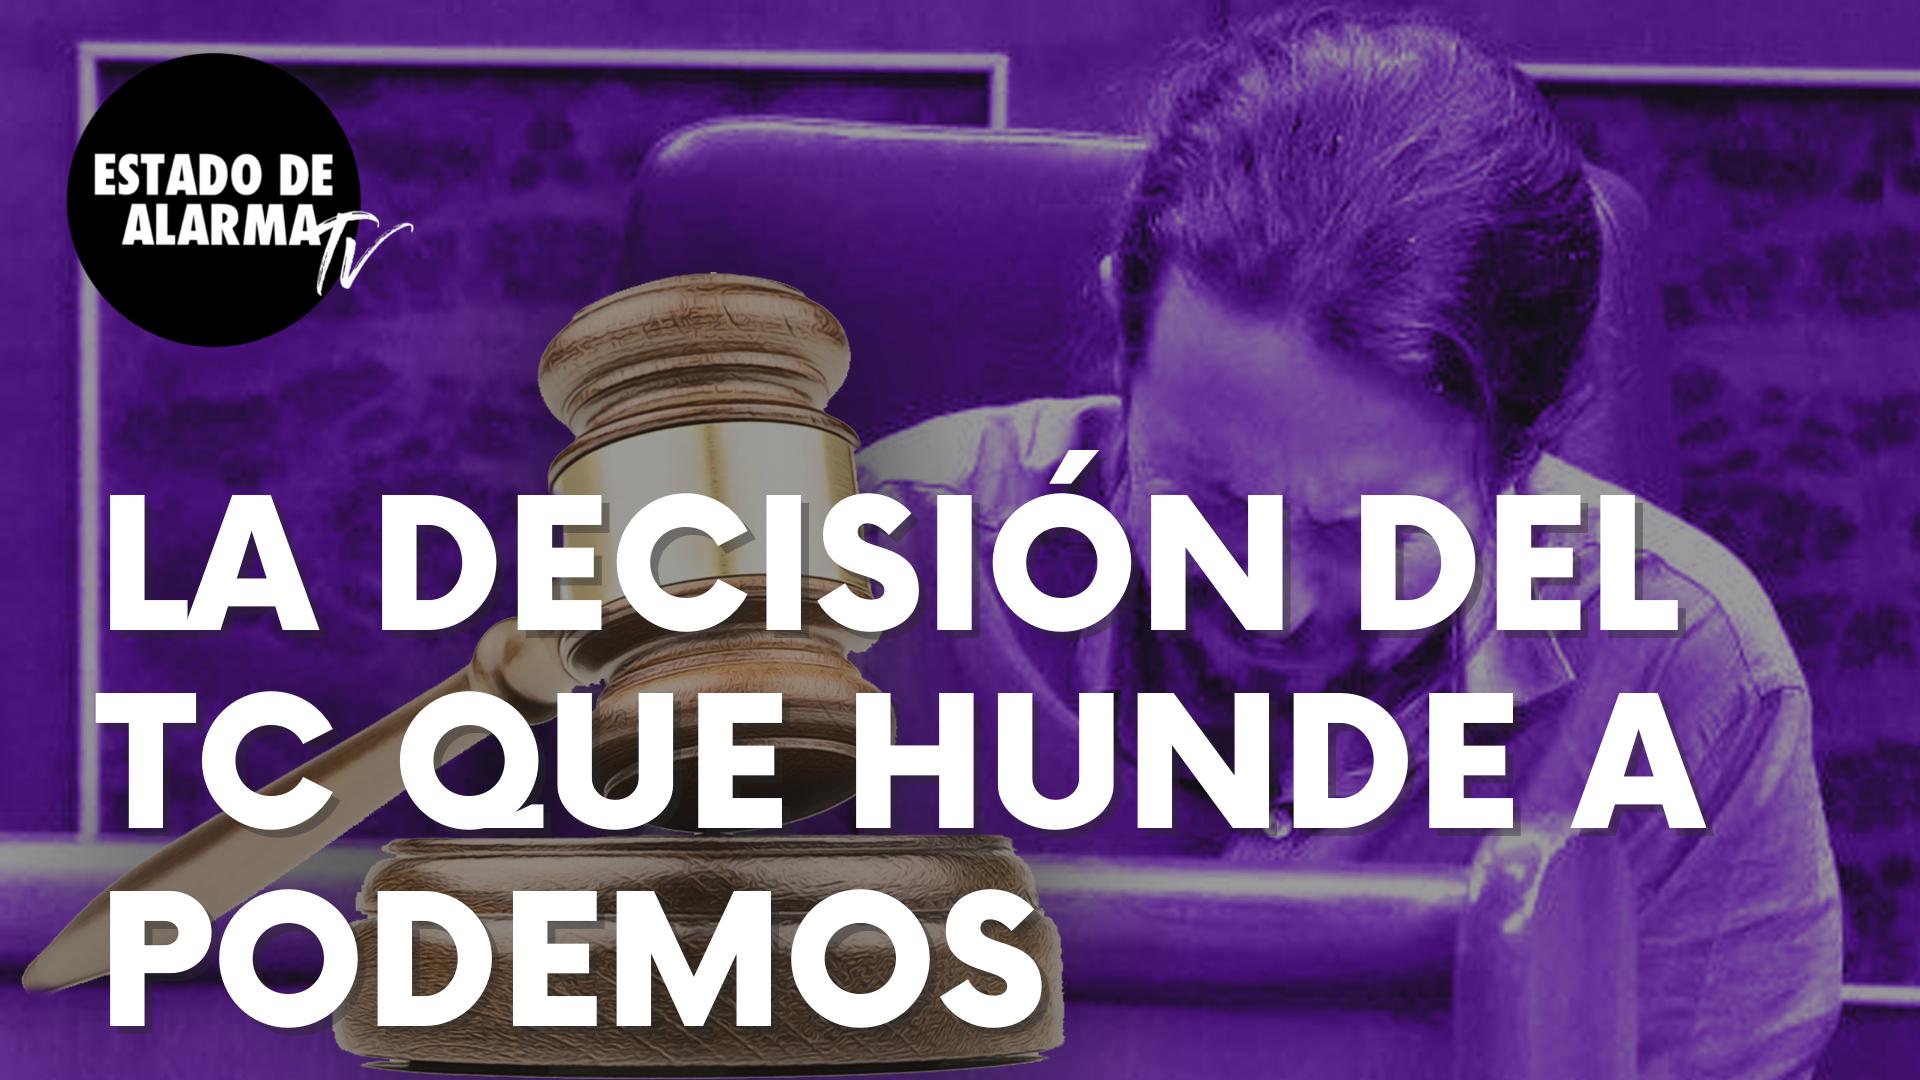 El decisión del Tribunal Constitucional tras el recurso de Vox que hunde a Podemos e Iván Redondo